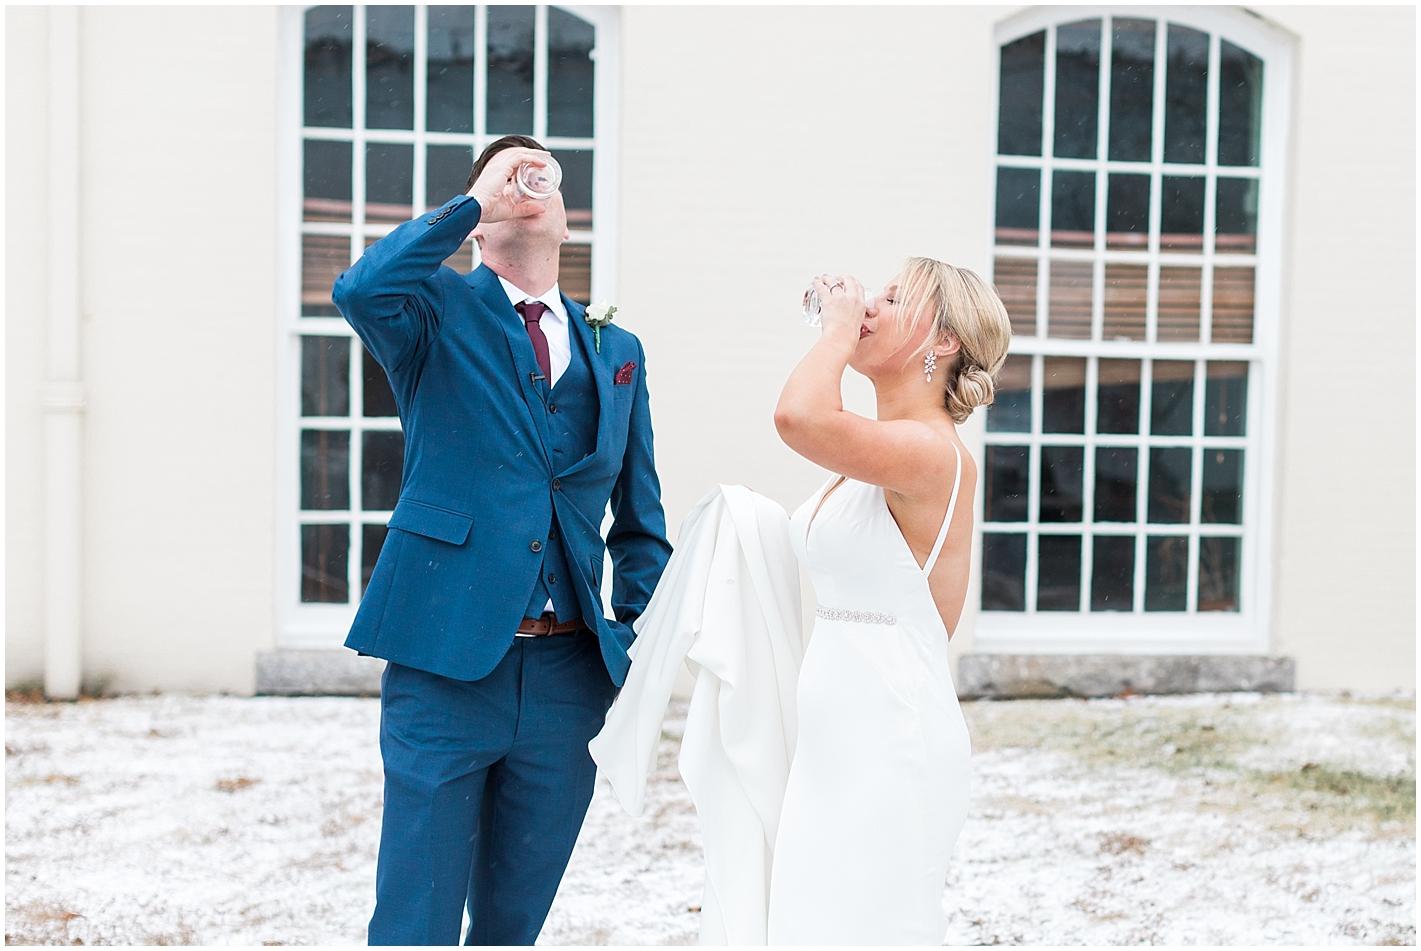 Wedding day shots Photo by Alyssa Parker Photography